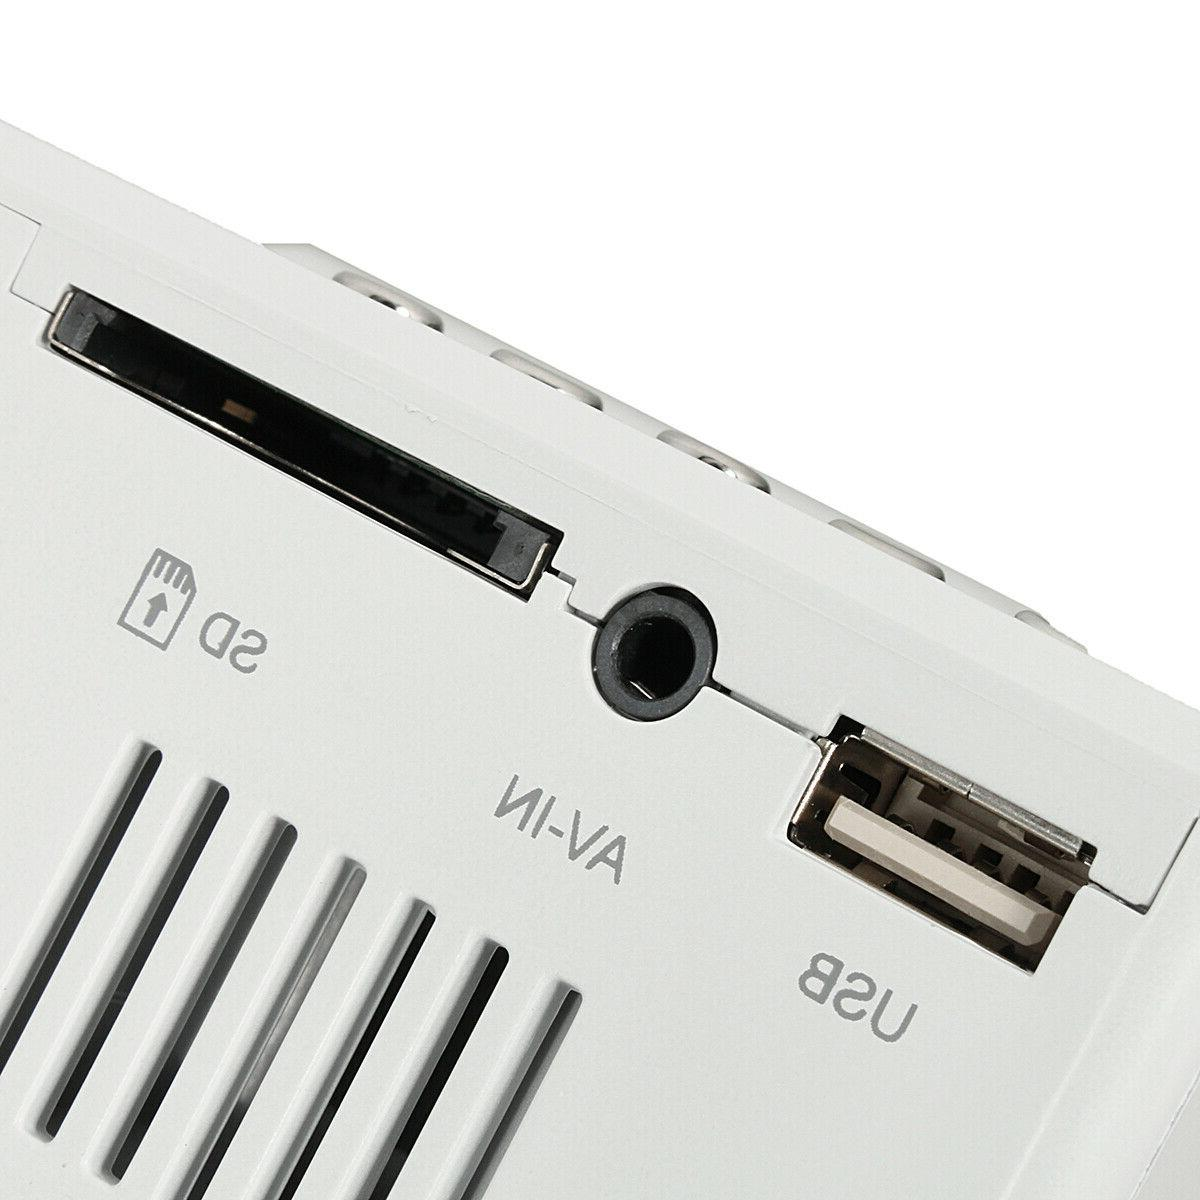 Full 1080P Projector HDMI